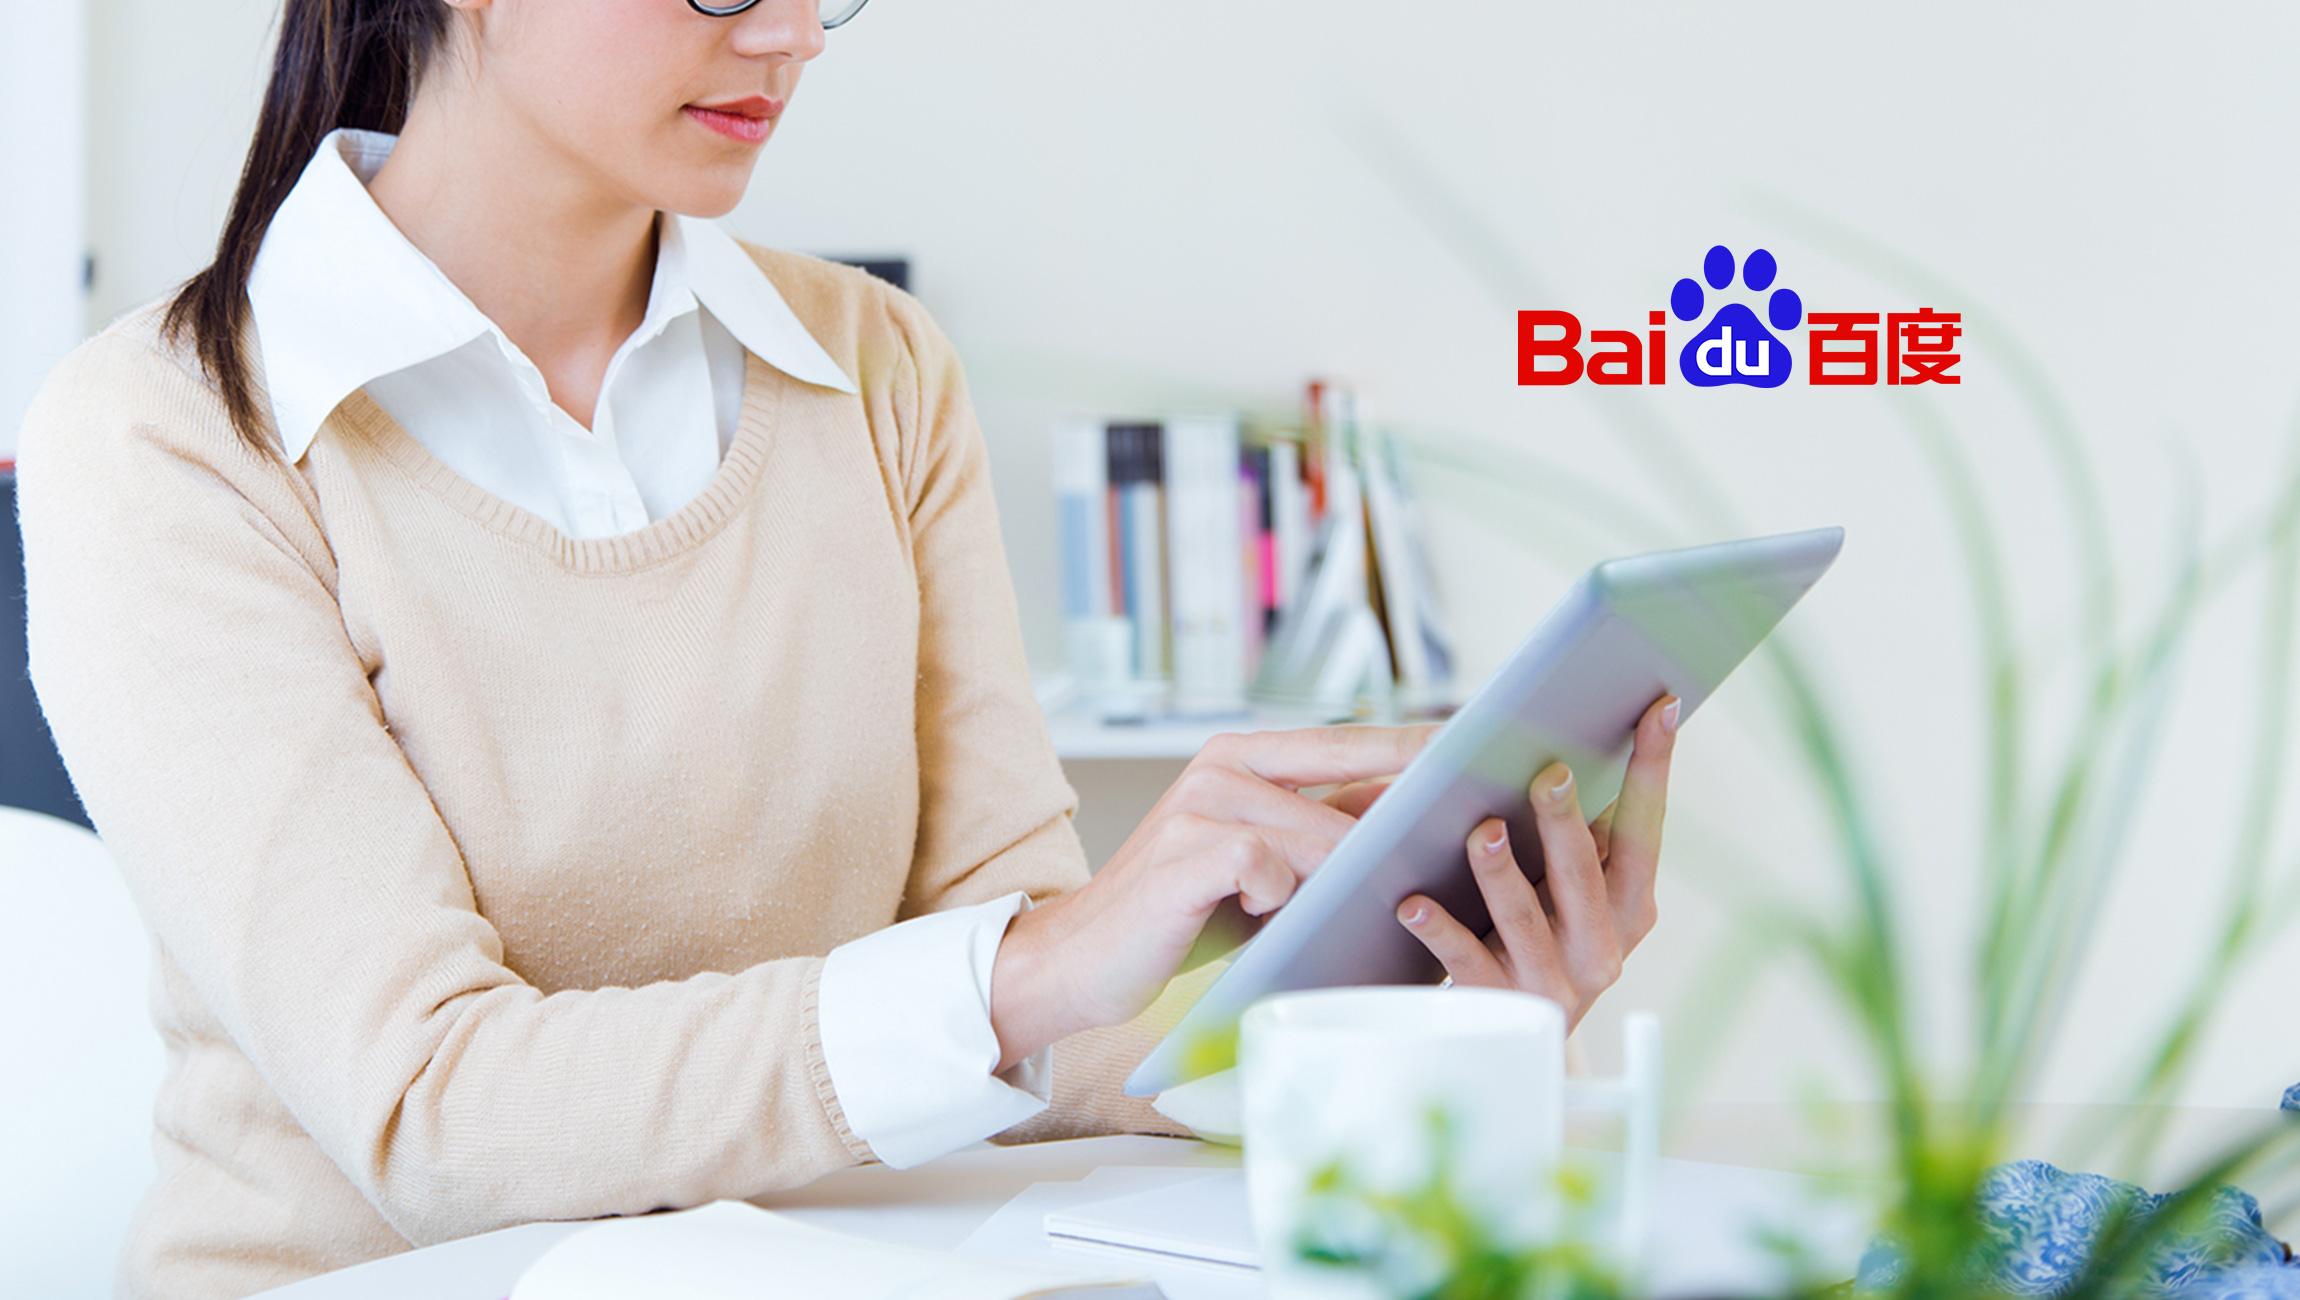 Baidu and Chongqing Sign Strategic Partnership to Accelerate the Municipality's Intelligent Transformation Using AI